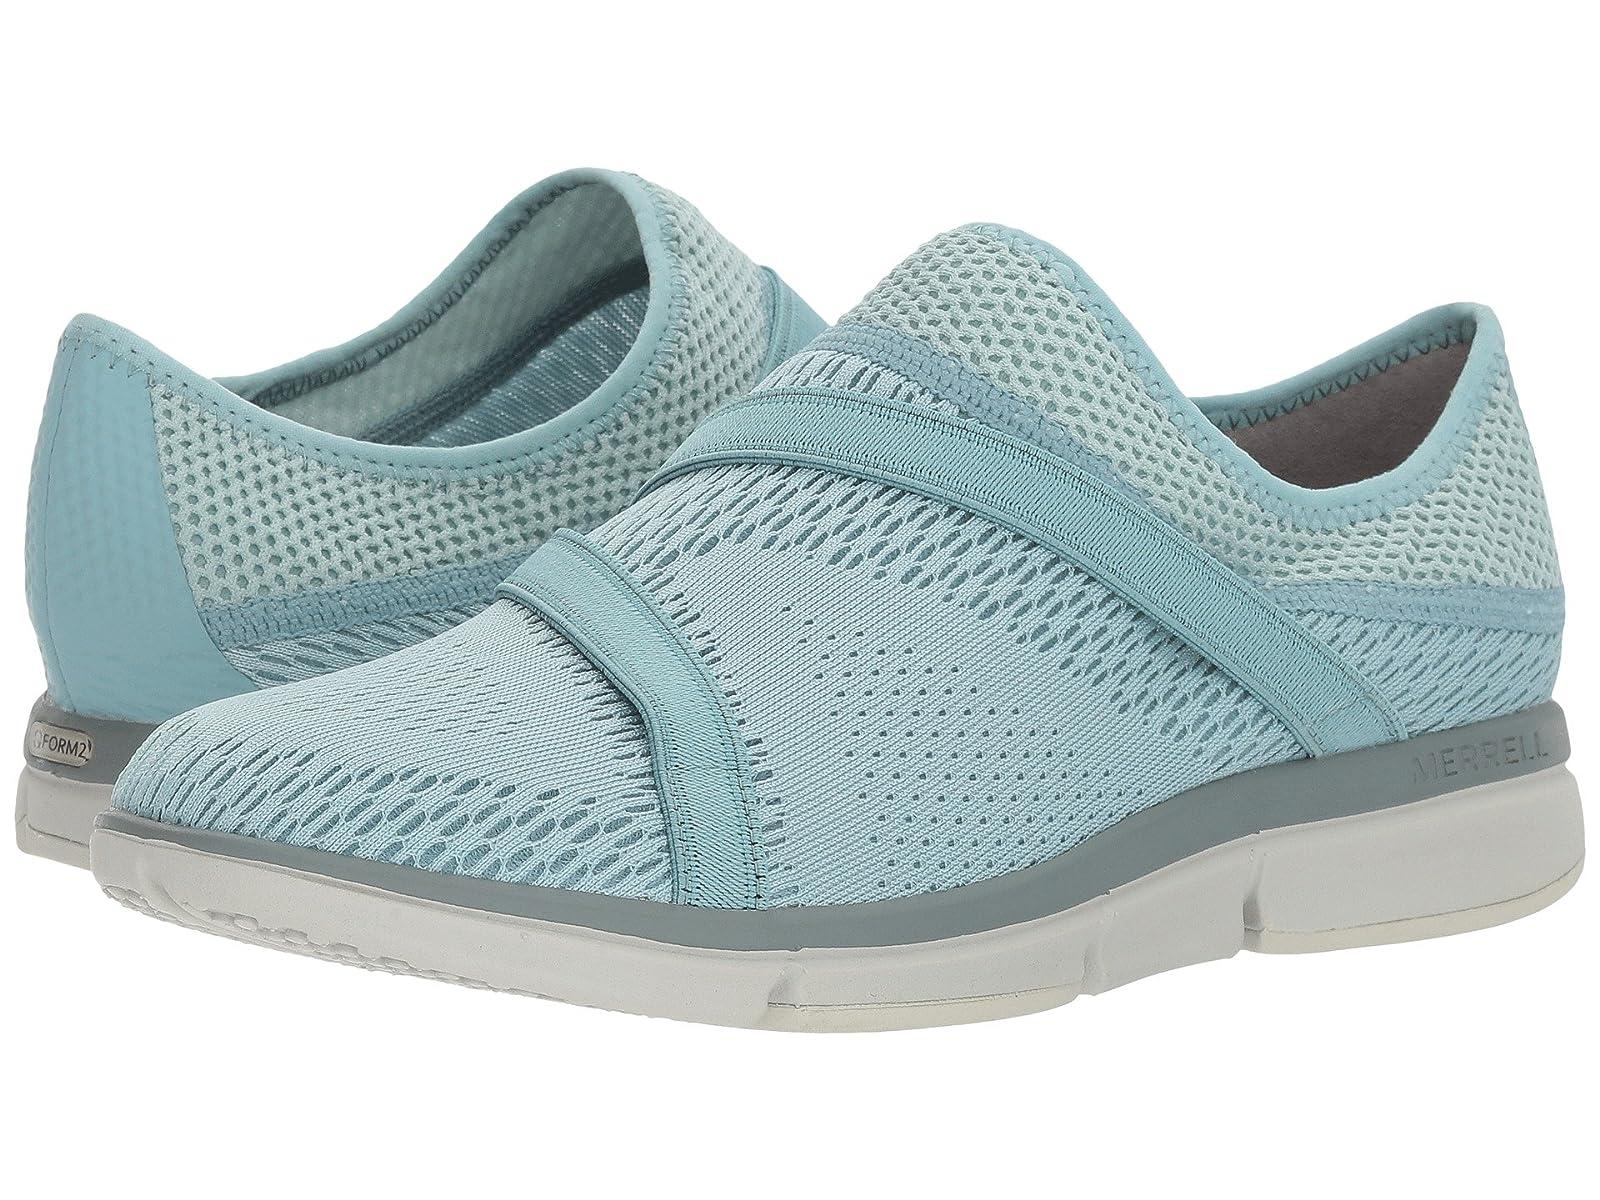 Merrell Zoe Sojourn E-Mesh Q2Cheap and distinctive eye-catching shoes